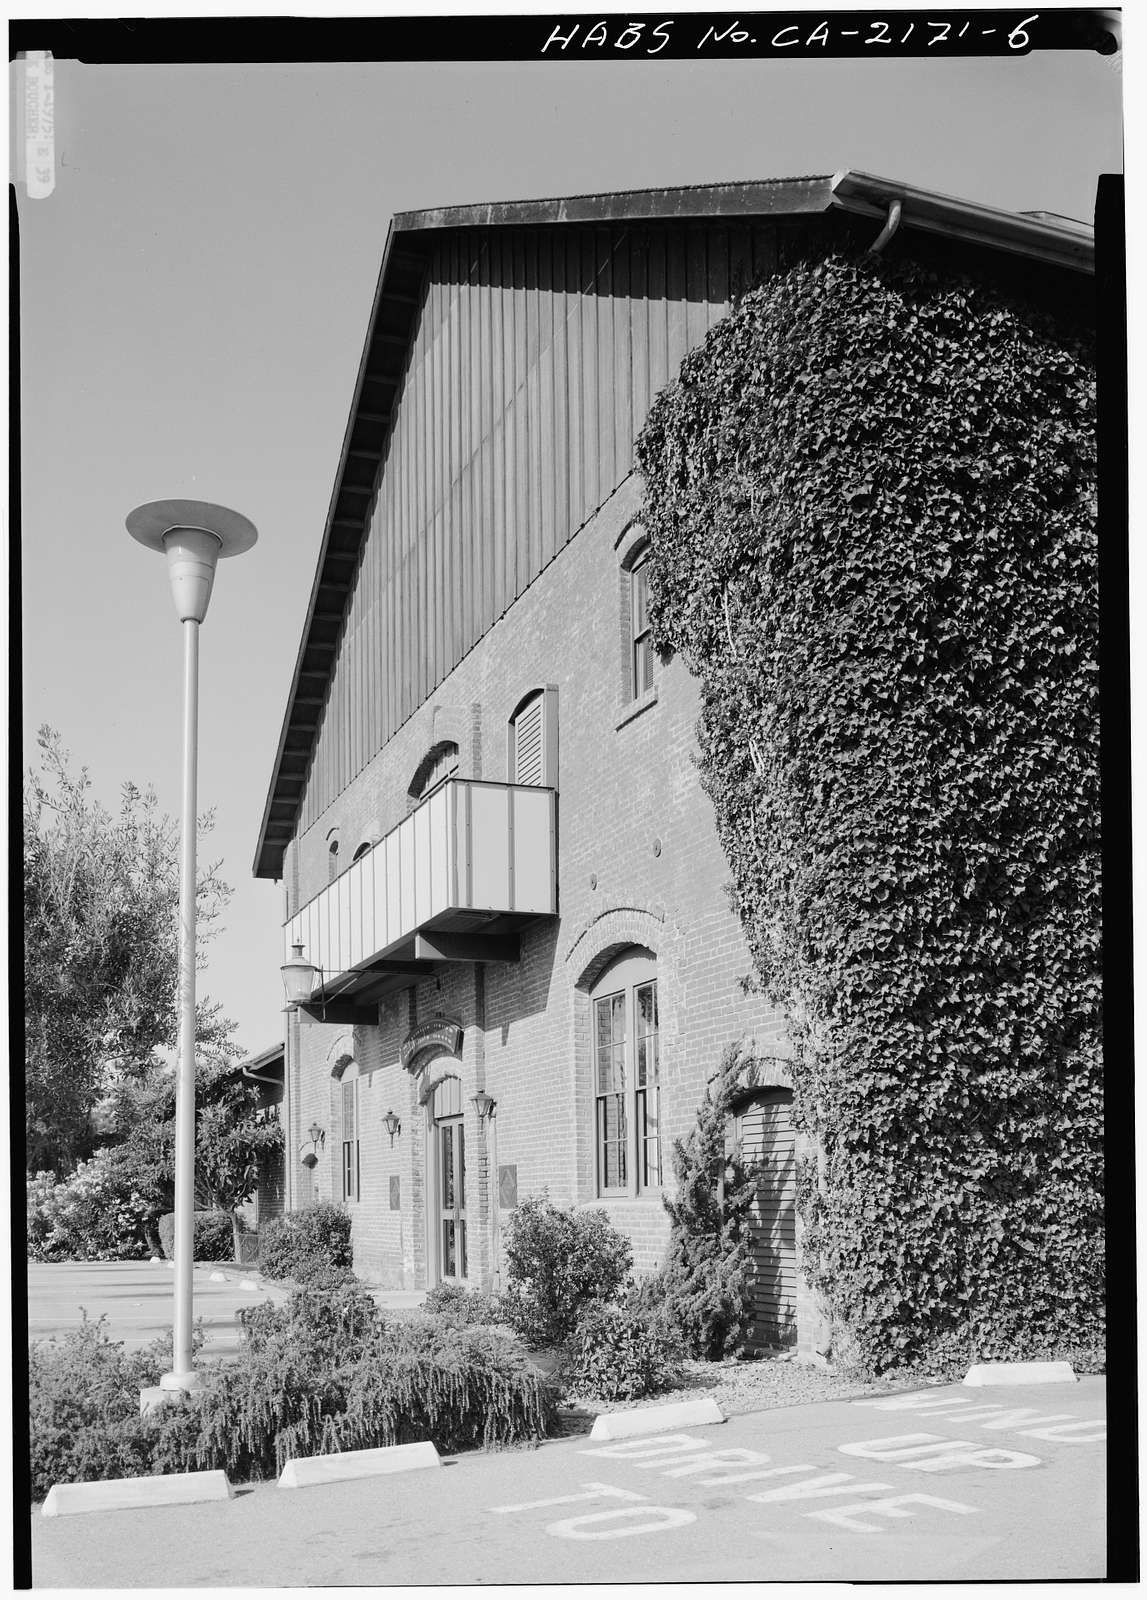 Palo Alto Winery, Welch Road at Quarry Road, Stanford, Santa Clara County, CA